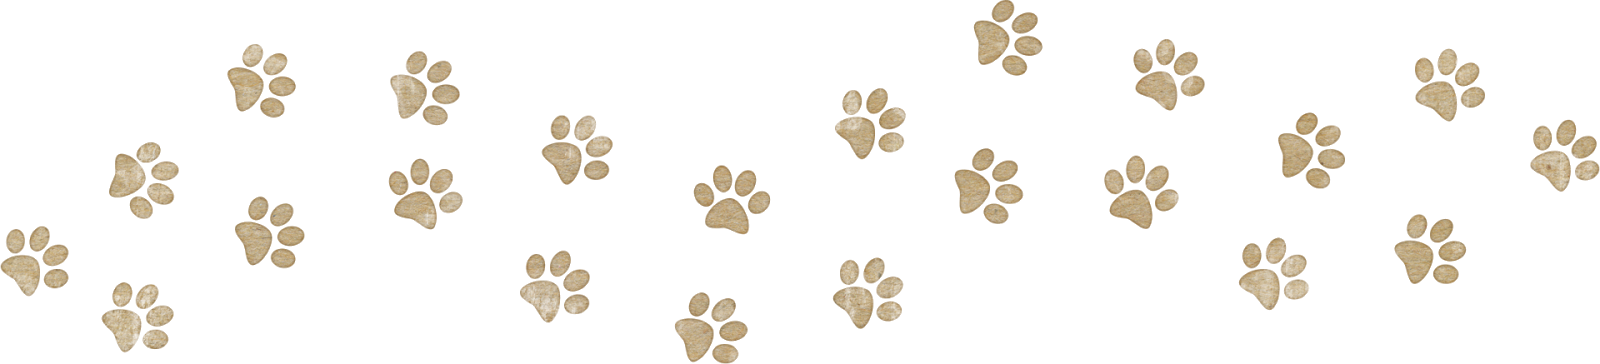 Eso Cats Paw  Billion Pixels